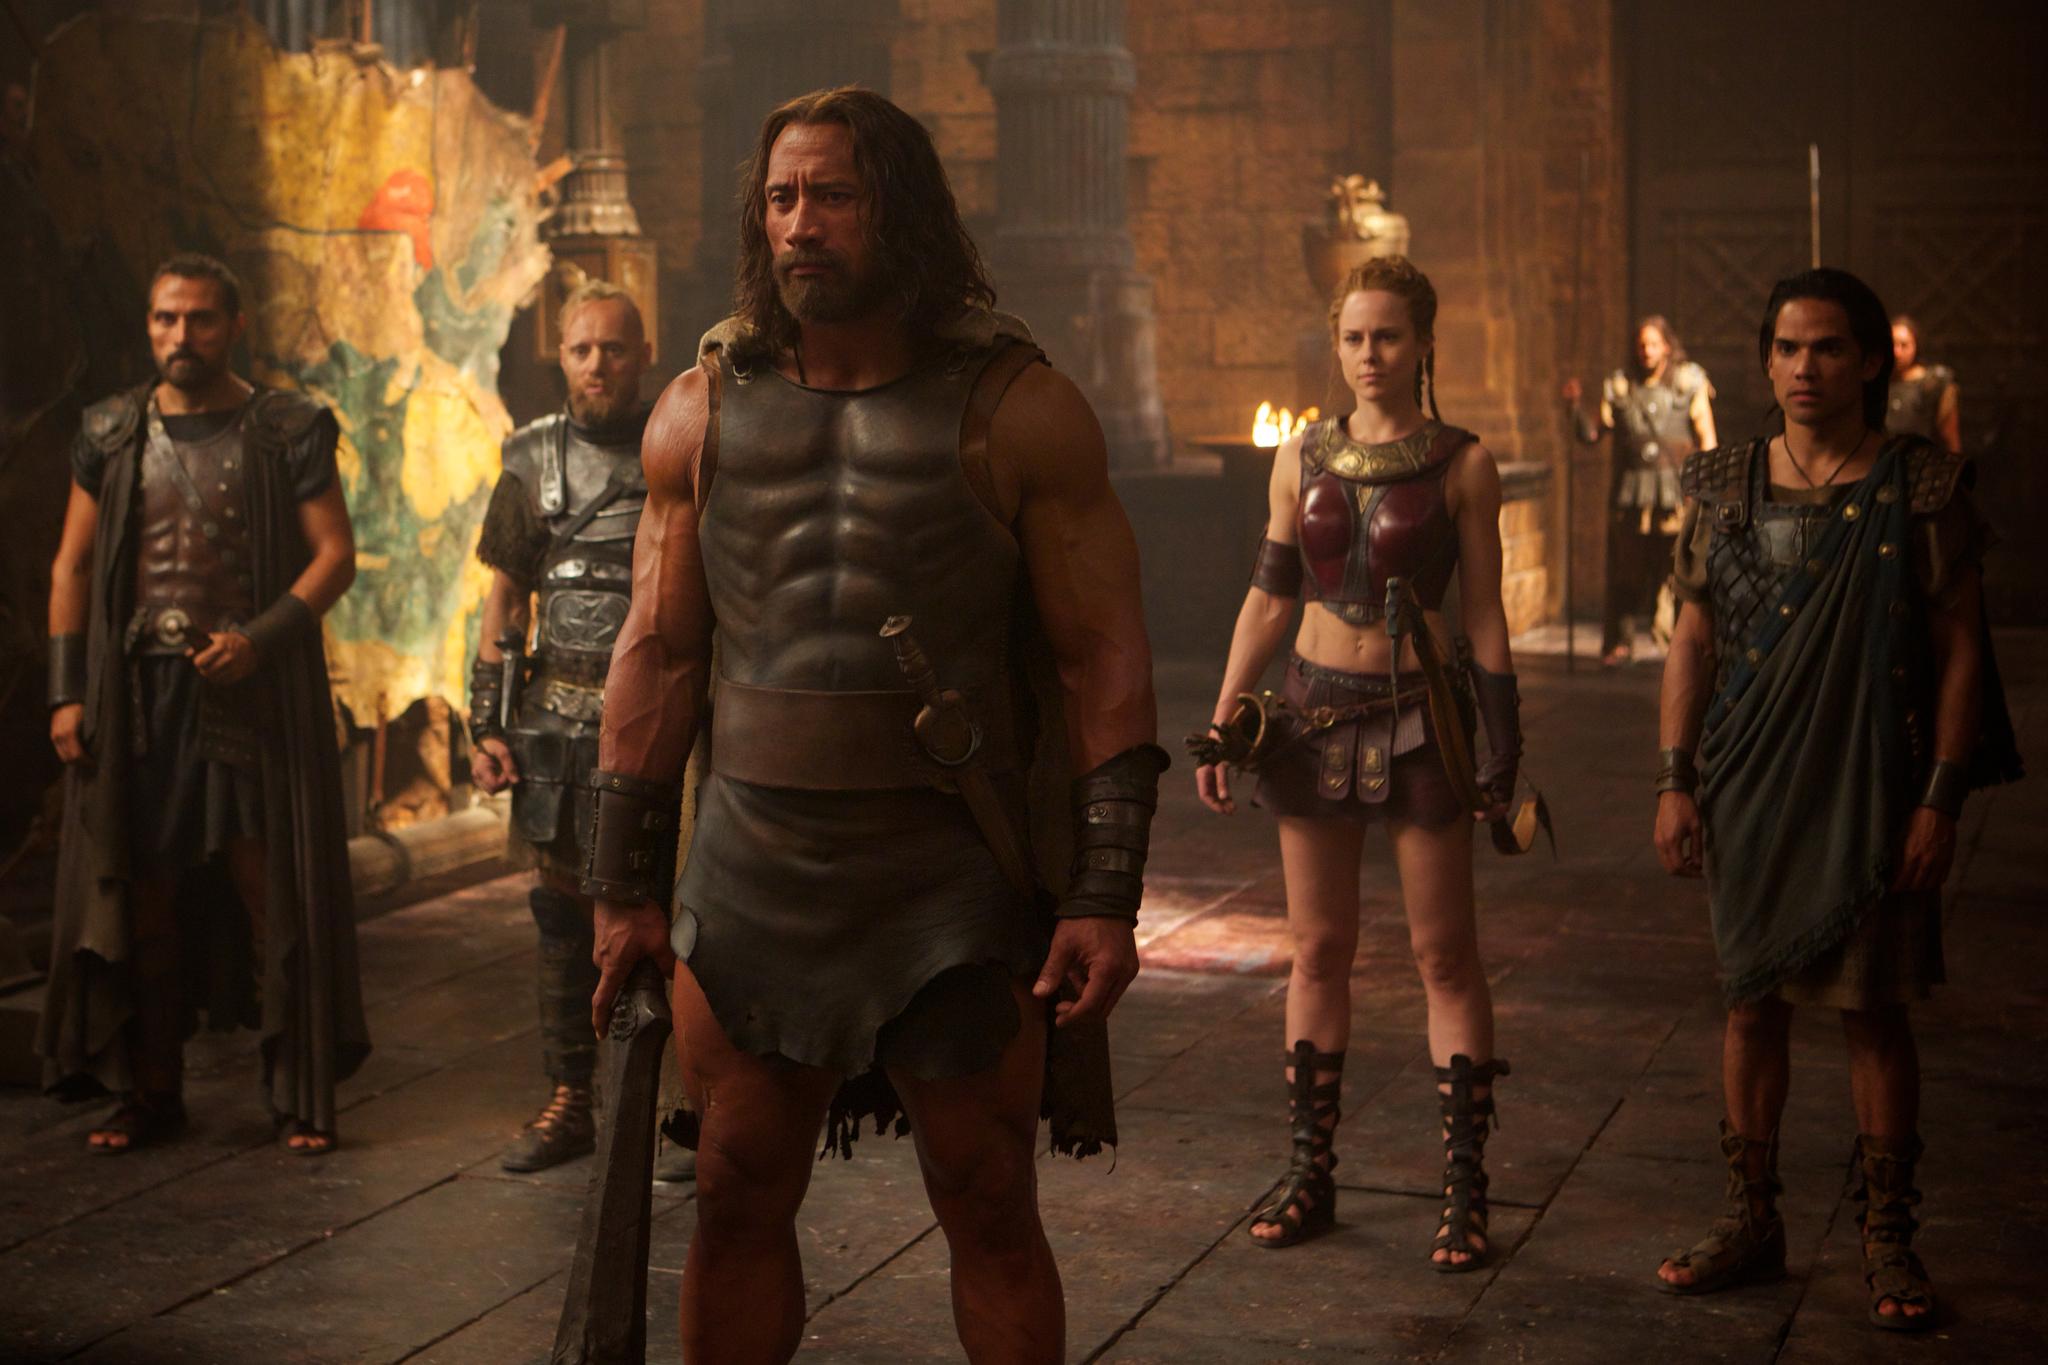 Rufus Sewell, Aksel Hennie, Dwayne Johnson, Ingrid Bolsø Berdal, and Reece Ritchie in Hercules (2014)